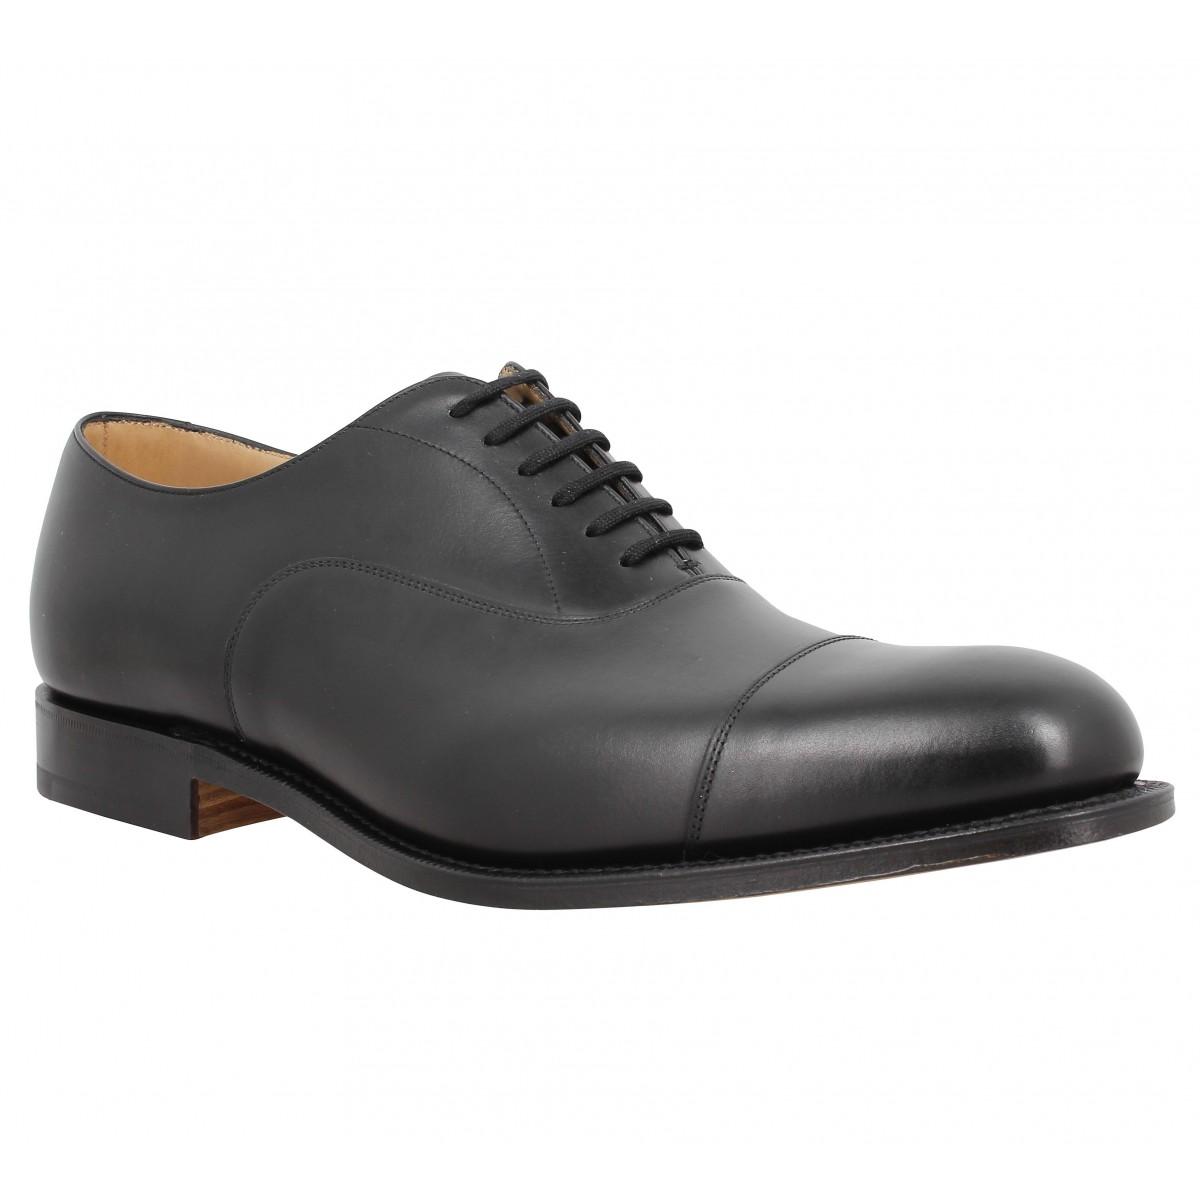 Chaussures à lacets CHURCH'S Dubai cuir Noir